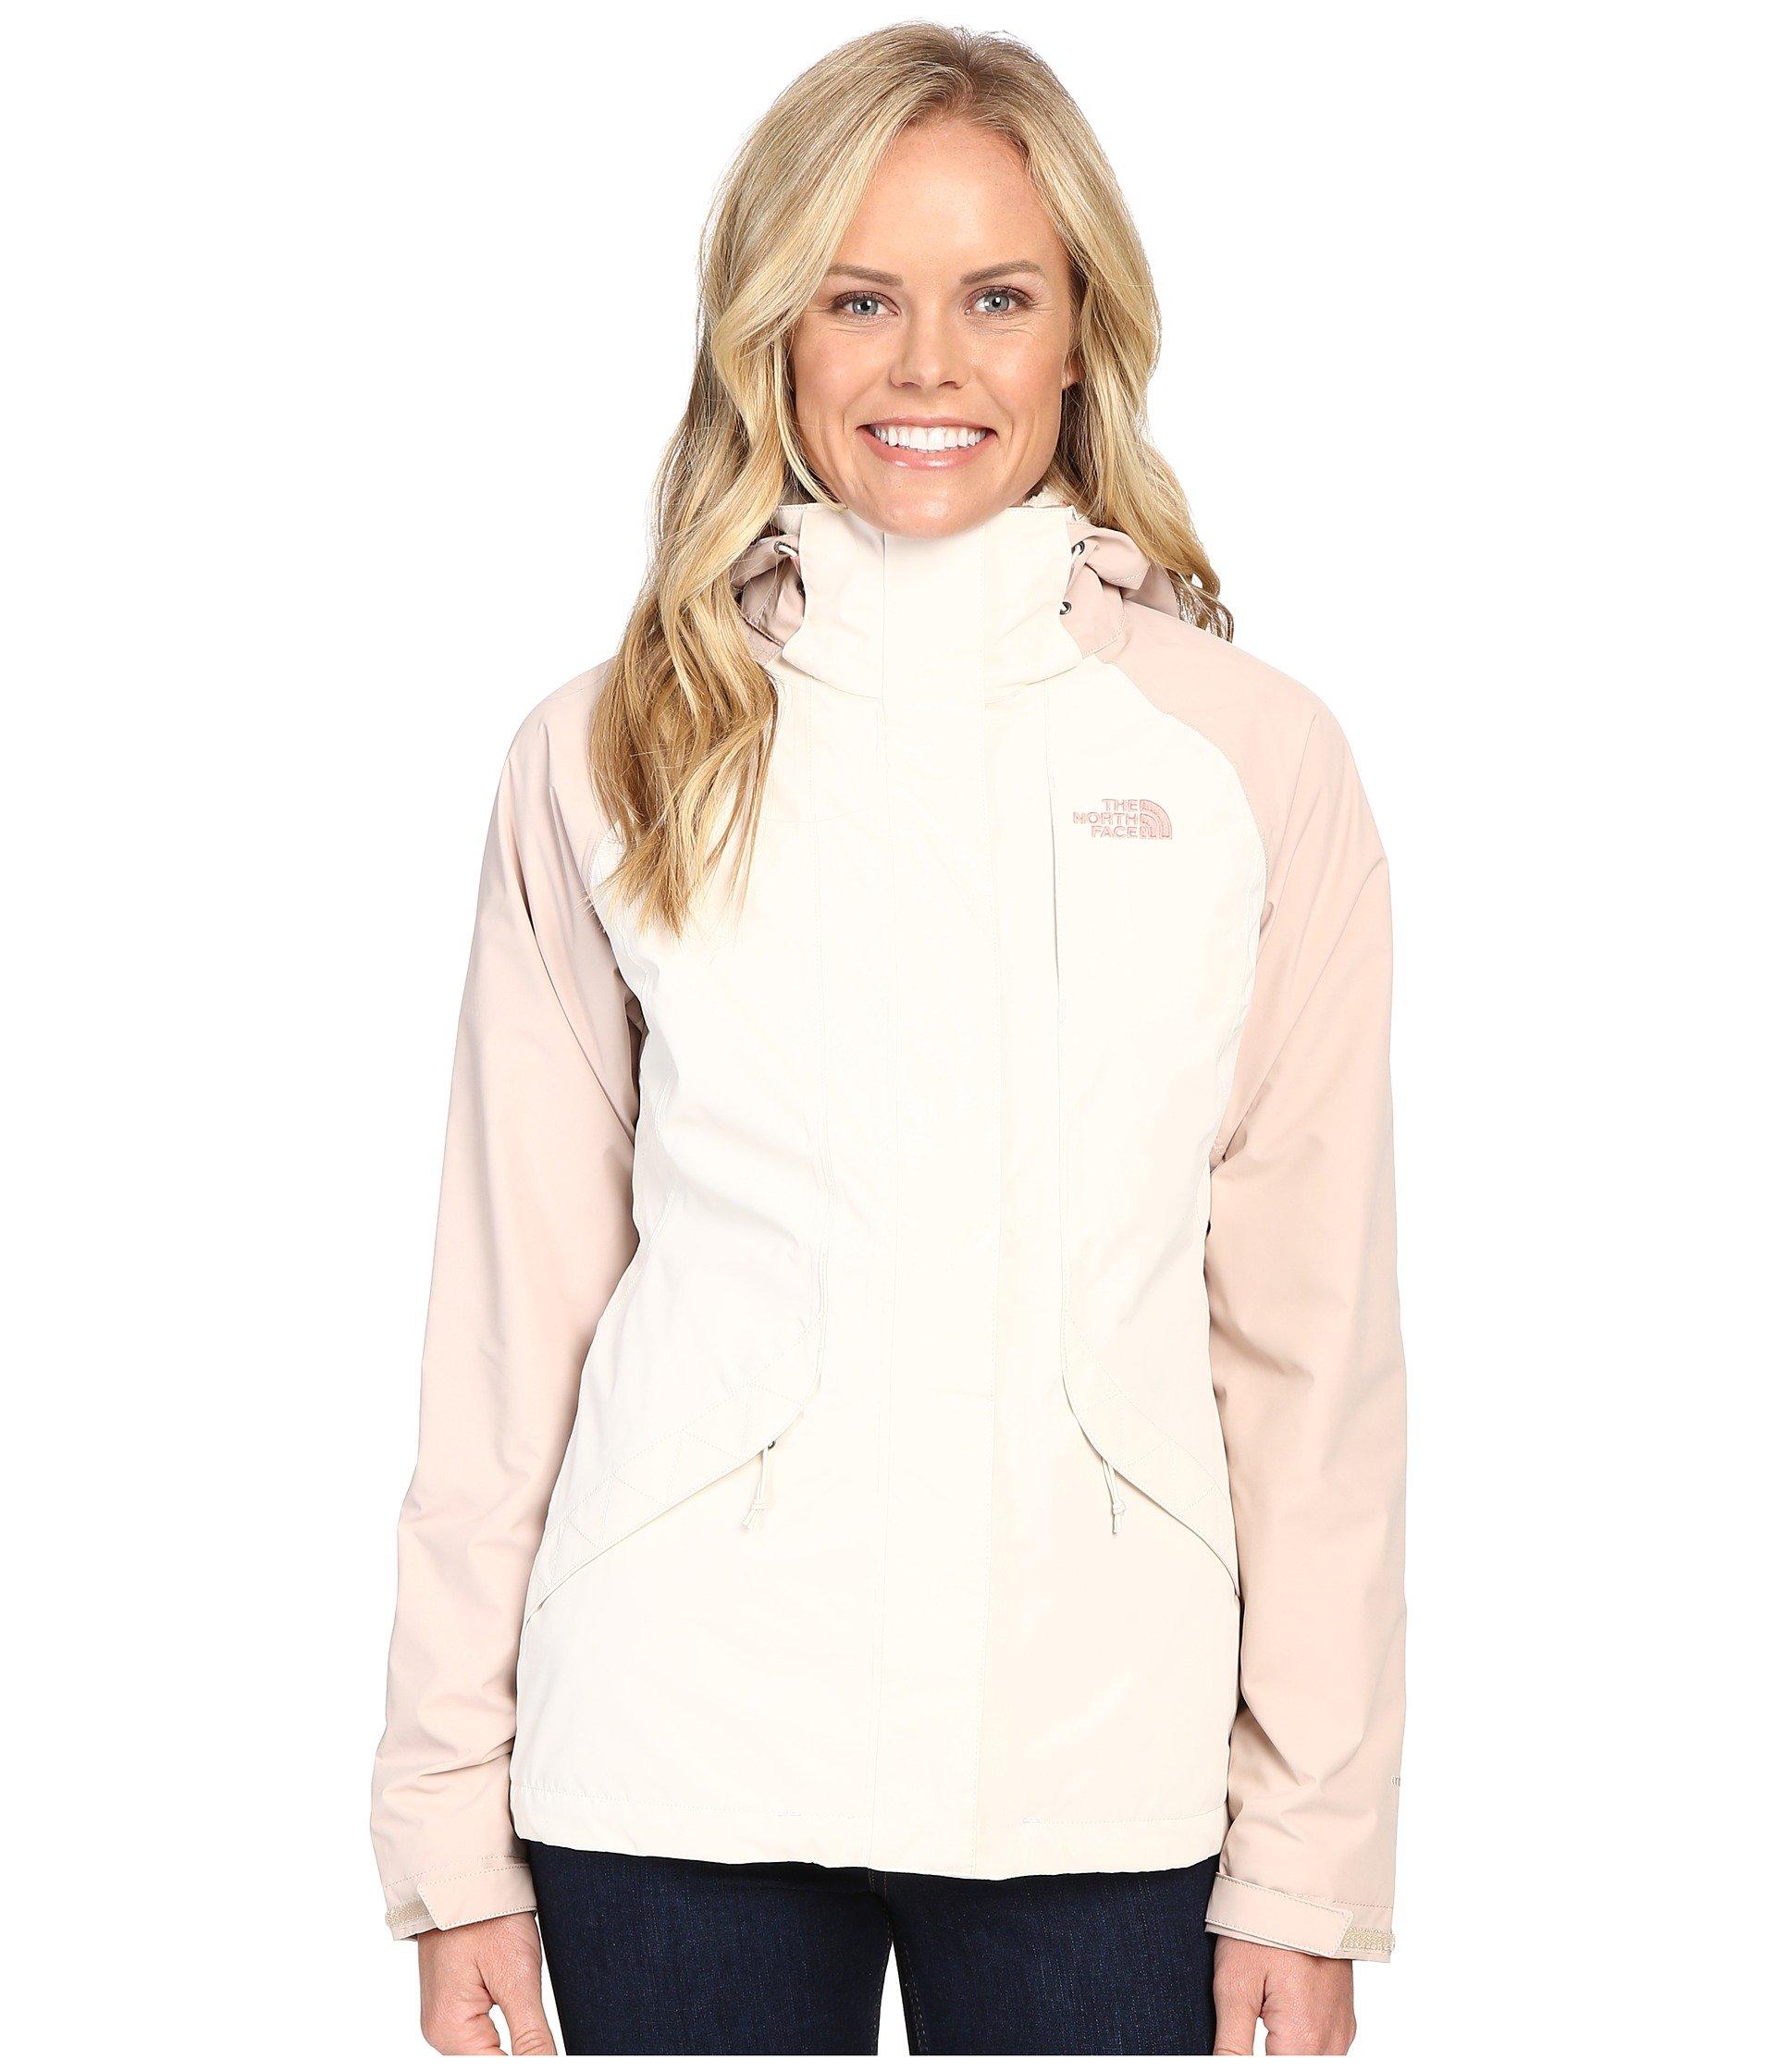 Boundary Triclimate® Jacket, Vintage White/Doeskin Brown (Prior Season)